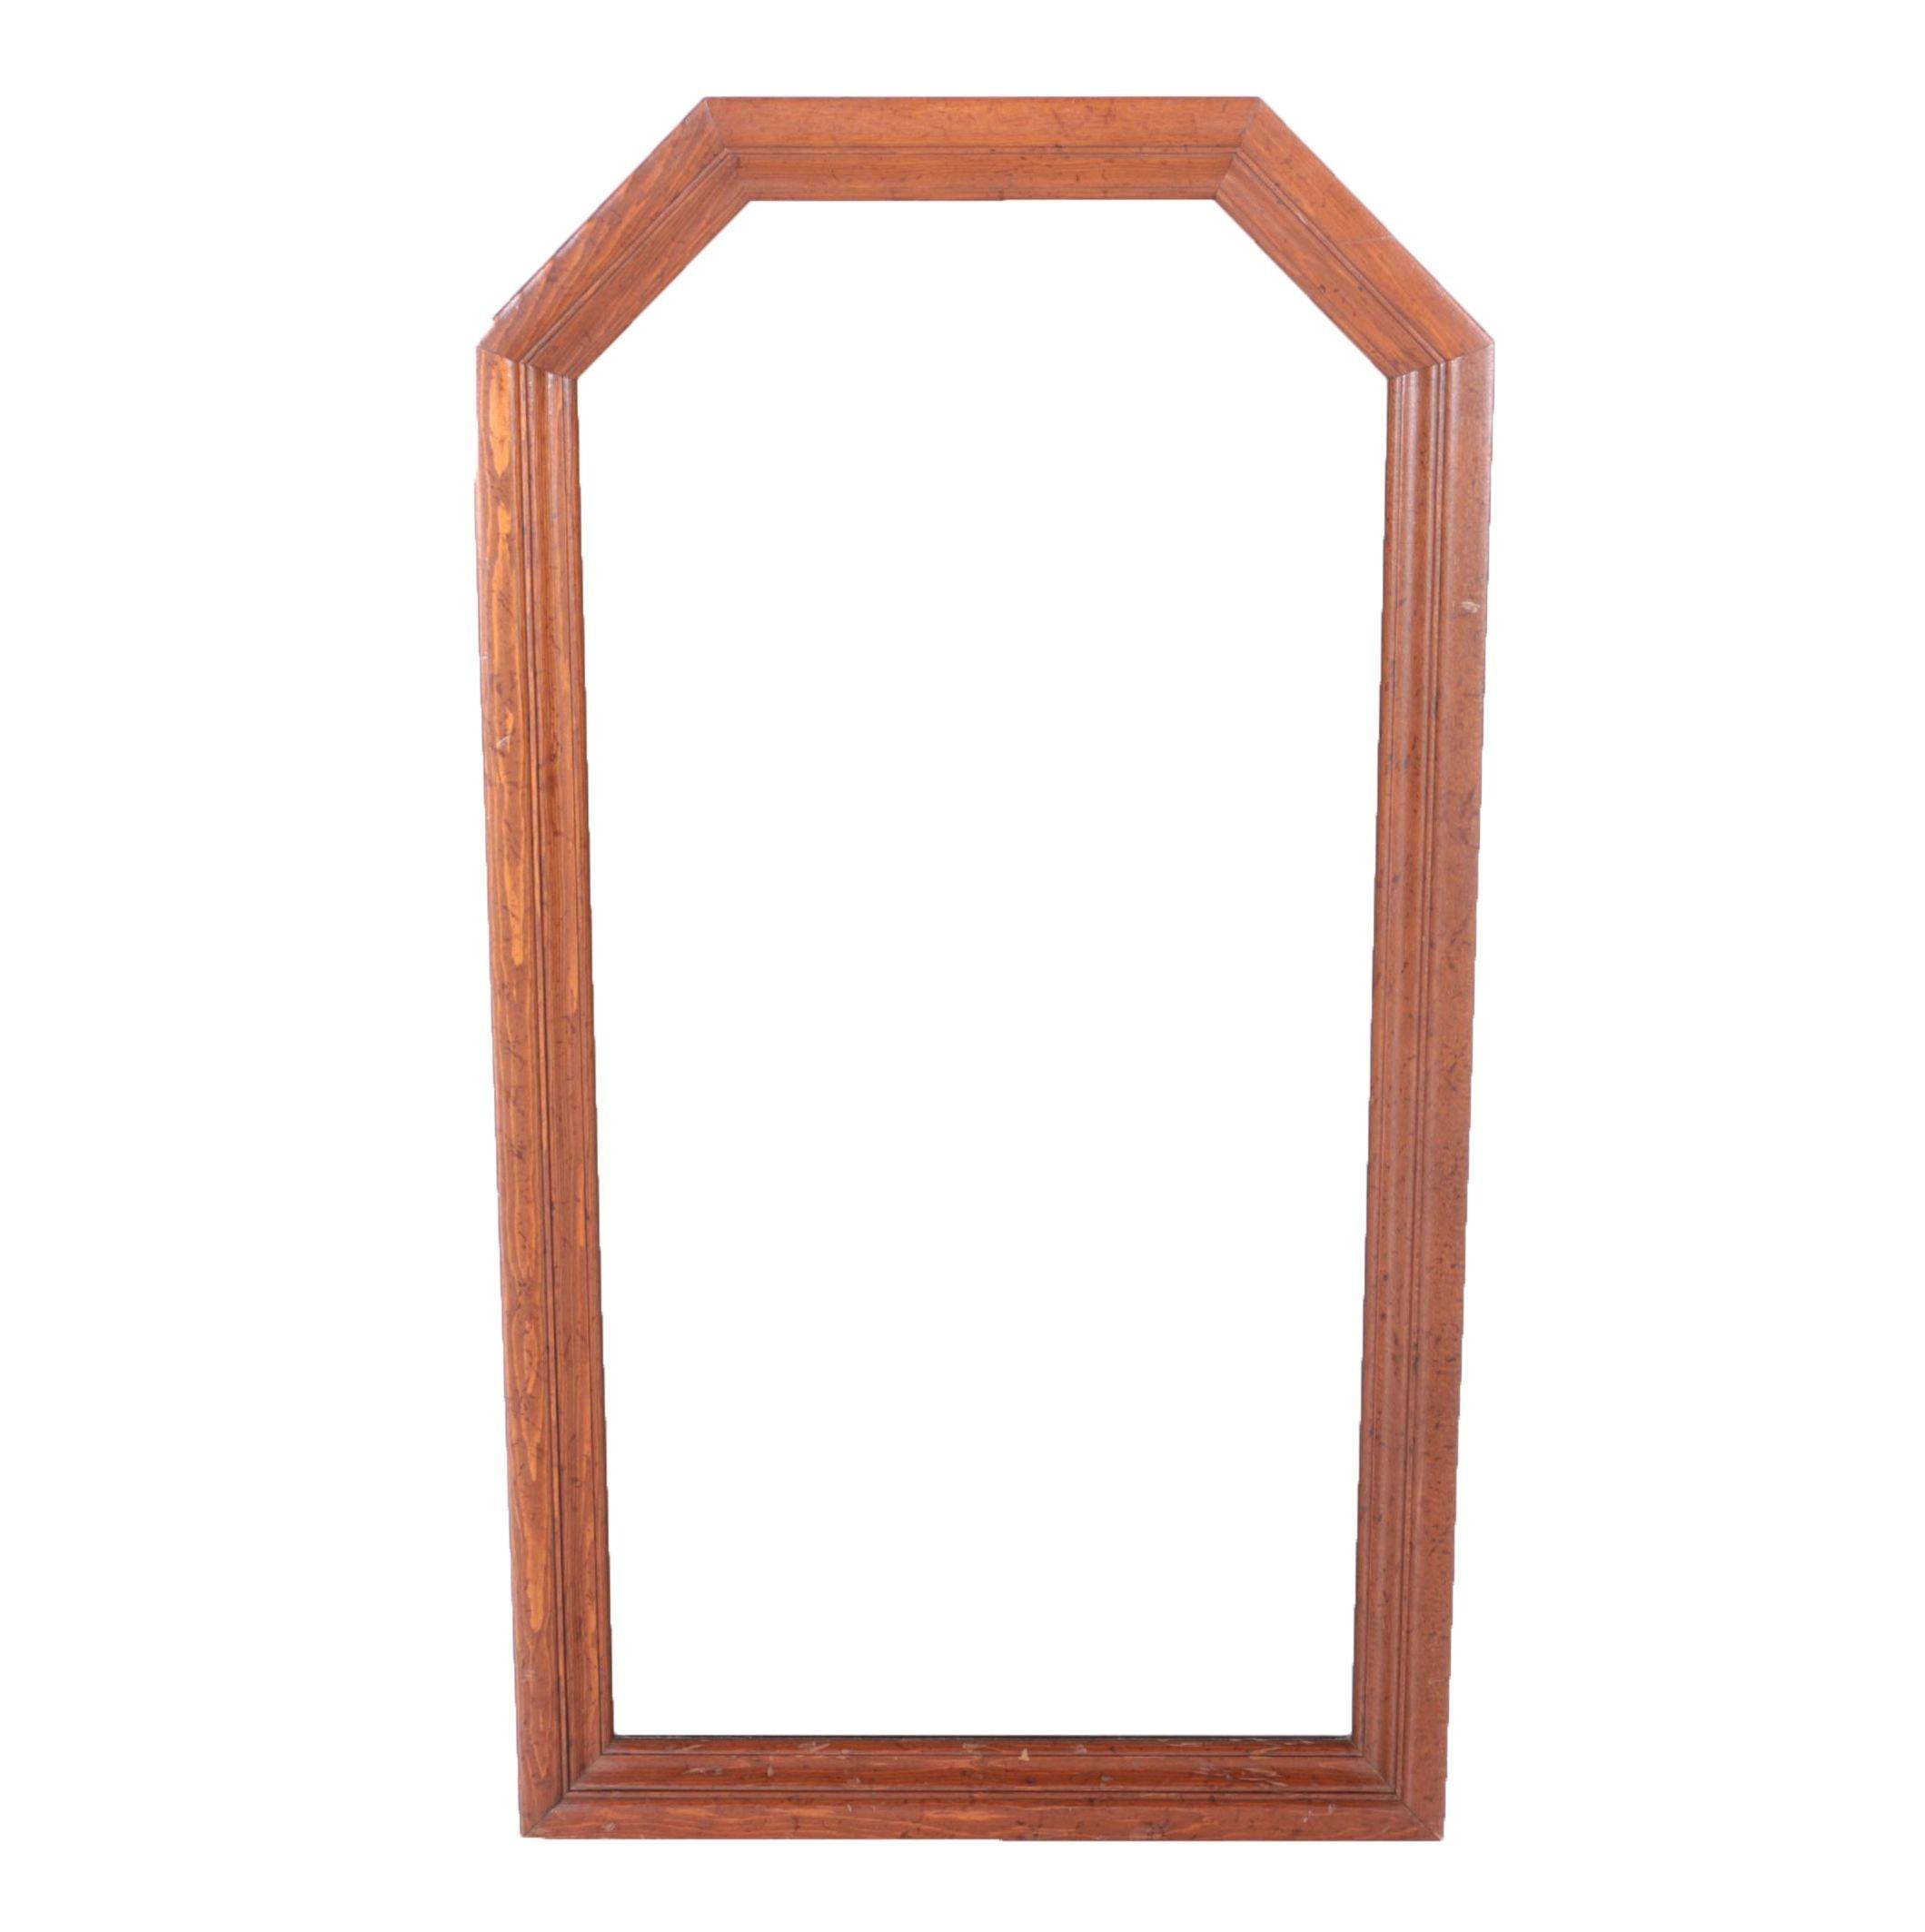 Ethan Allen Wood Framed Mirror